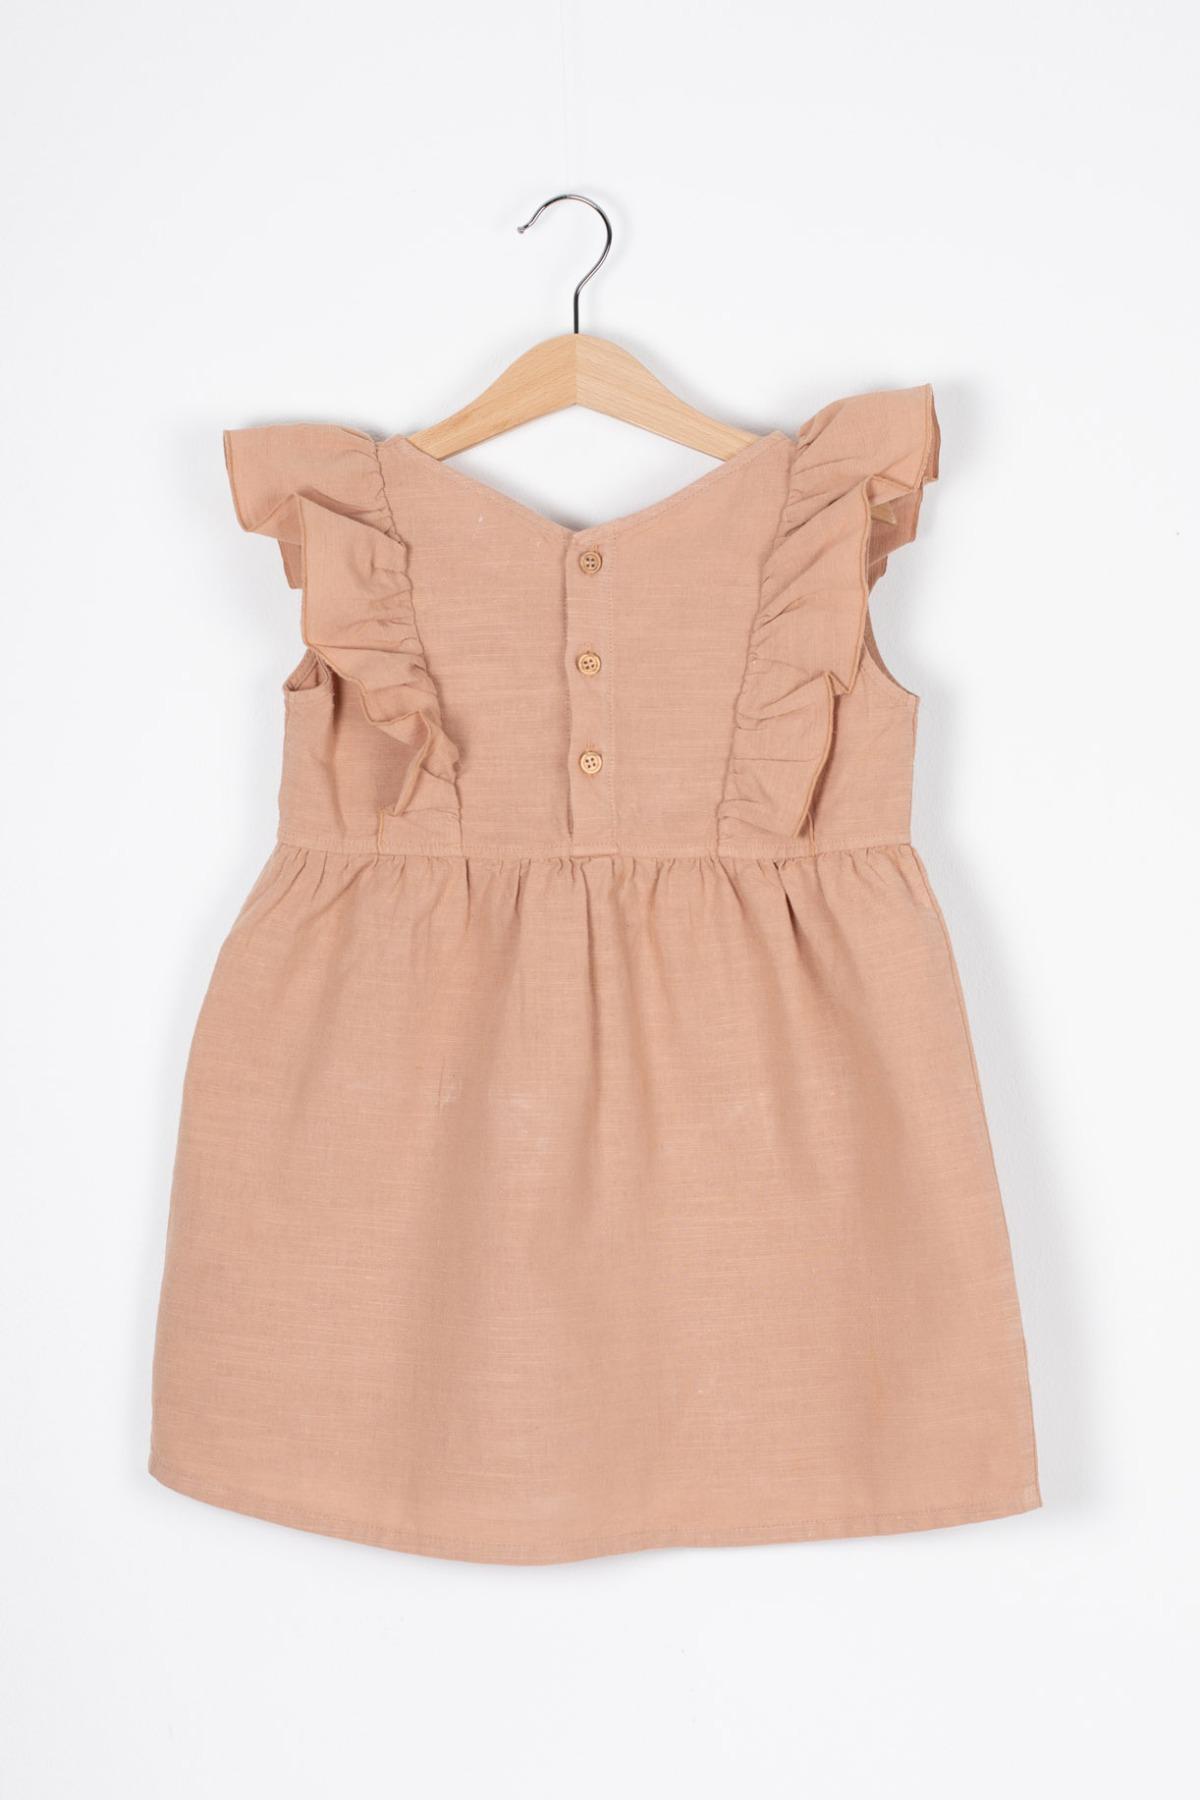 Mollet Tunika Tunic dress with flounces